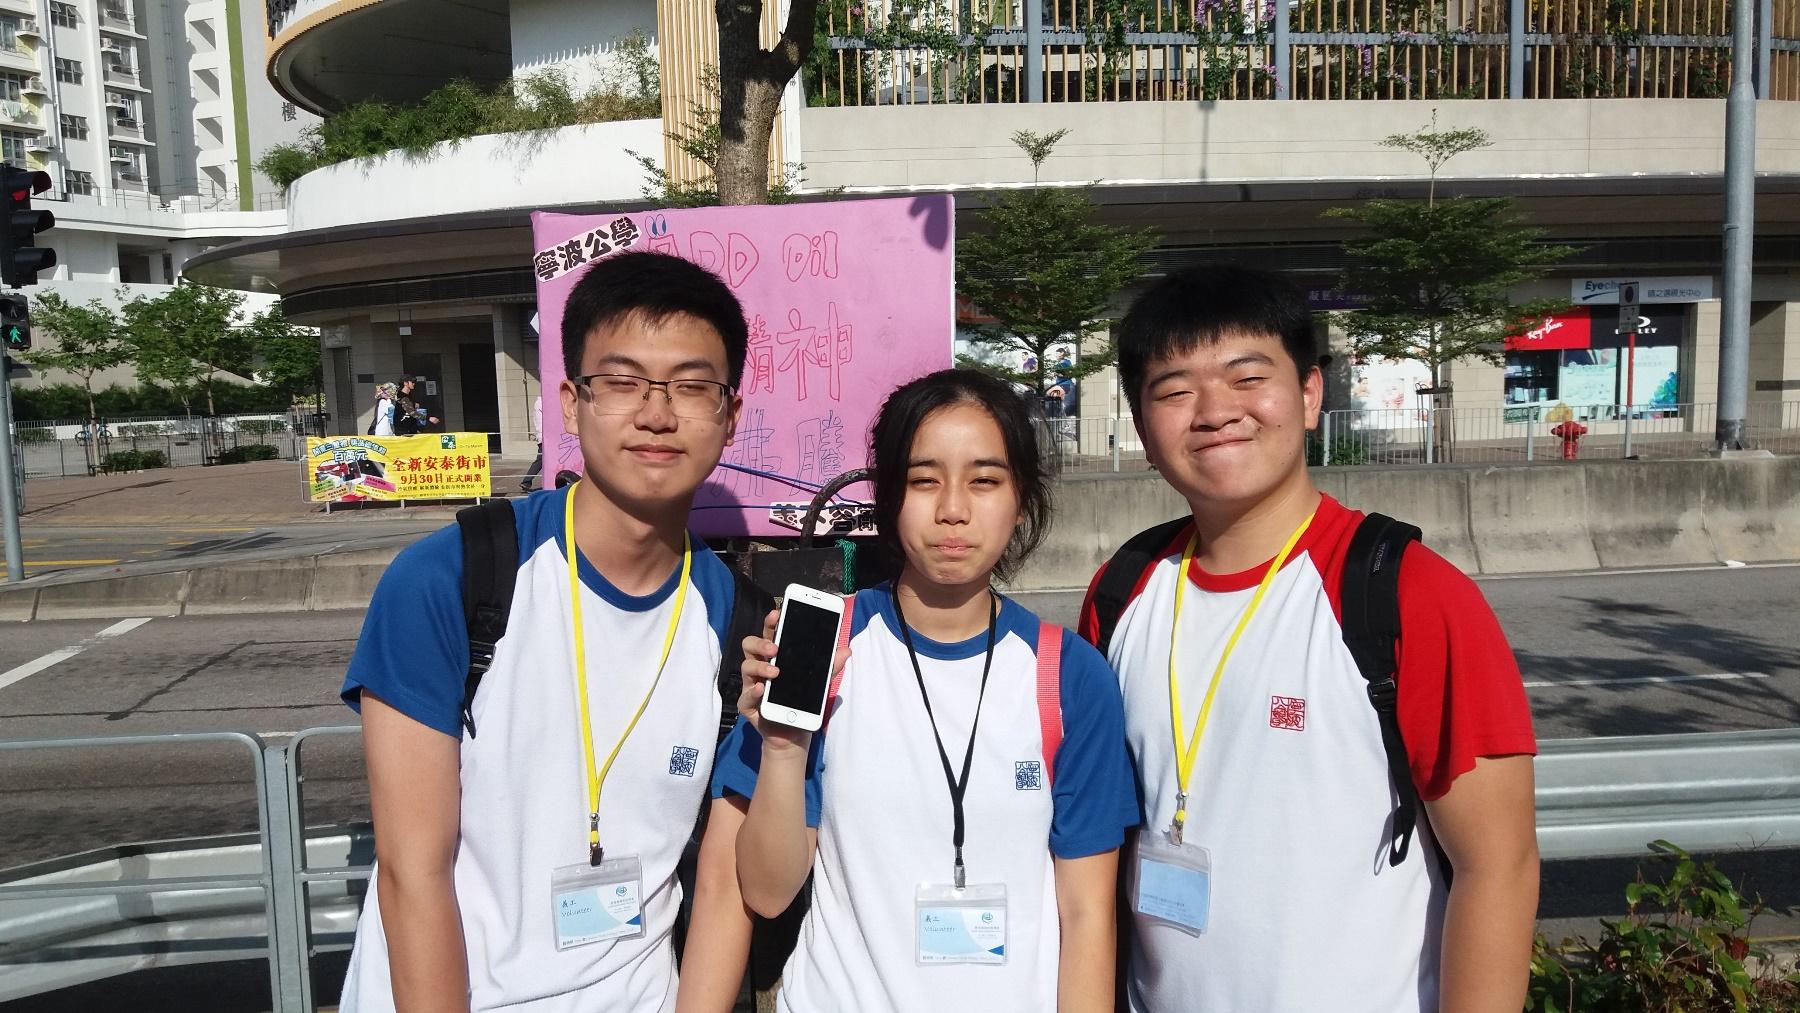 http://npc.edu.hk/sites/default/files/20181111_150917.jpg